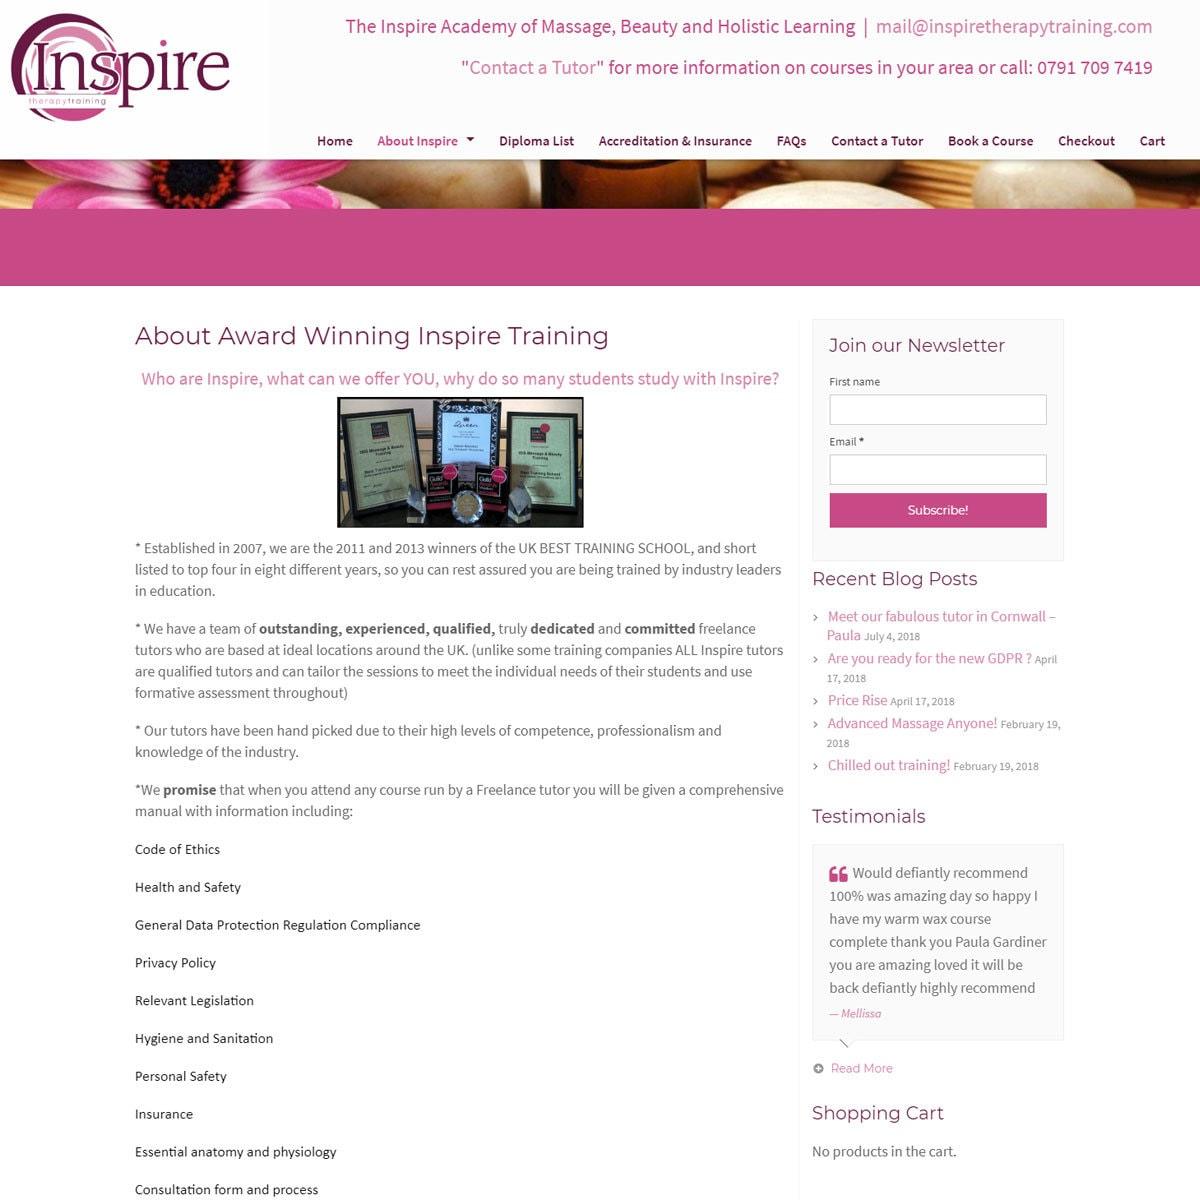 inspiretherapytraining